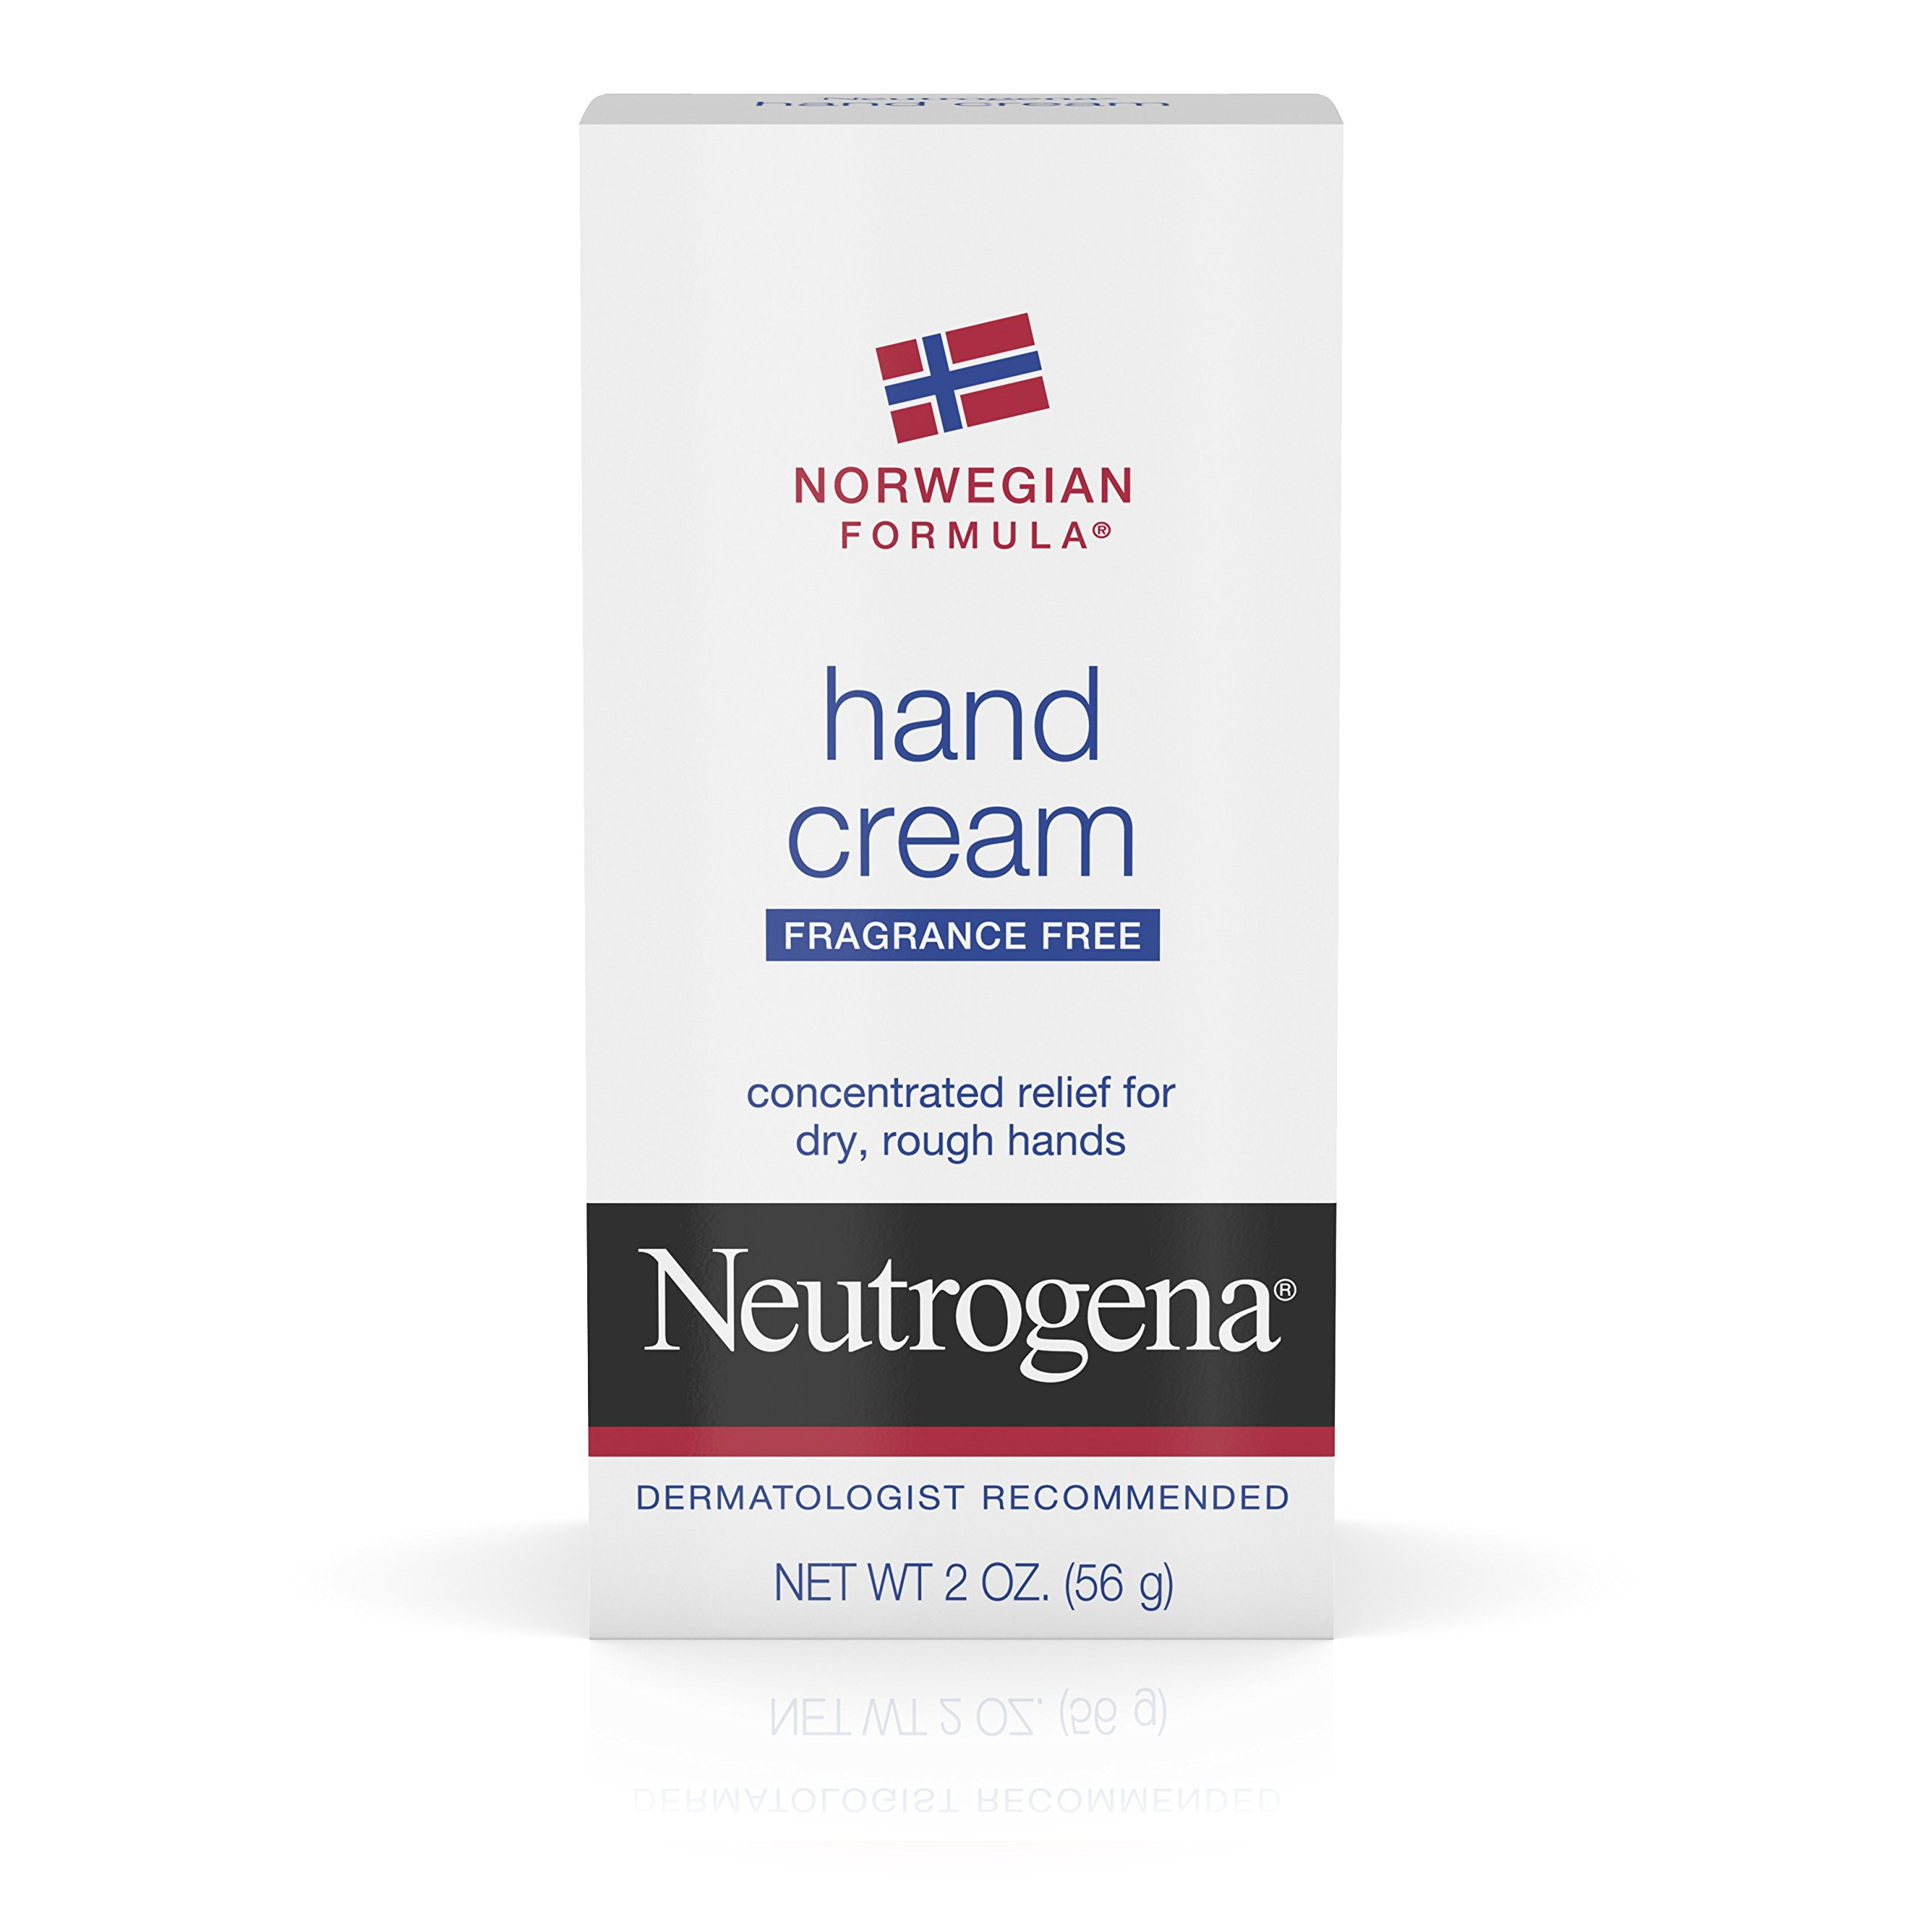 Neutrogena Norwegian Formula Moisturizing Hand Cream Formulated with Glycerin for Dry, Rough Hands, Fragrance-Free Intensive Hand Cream, 2 oz(Pack of 6)